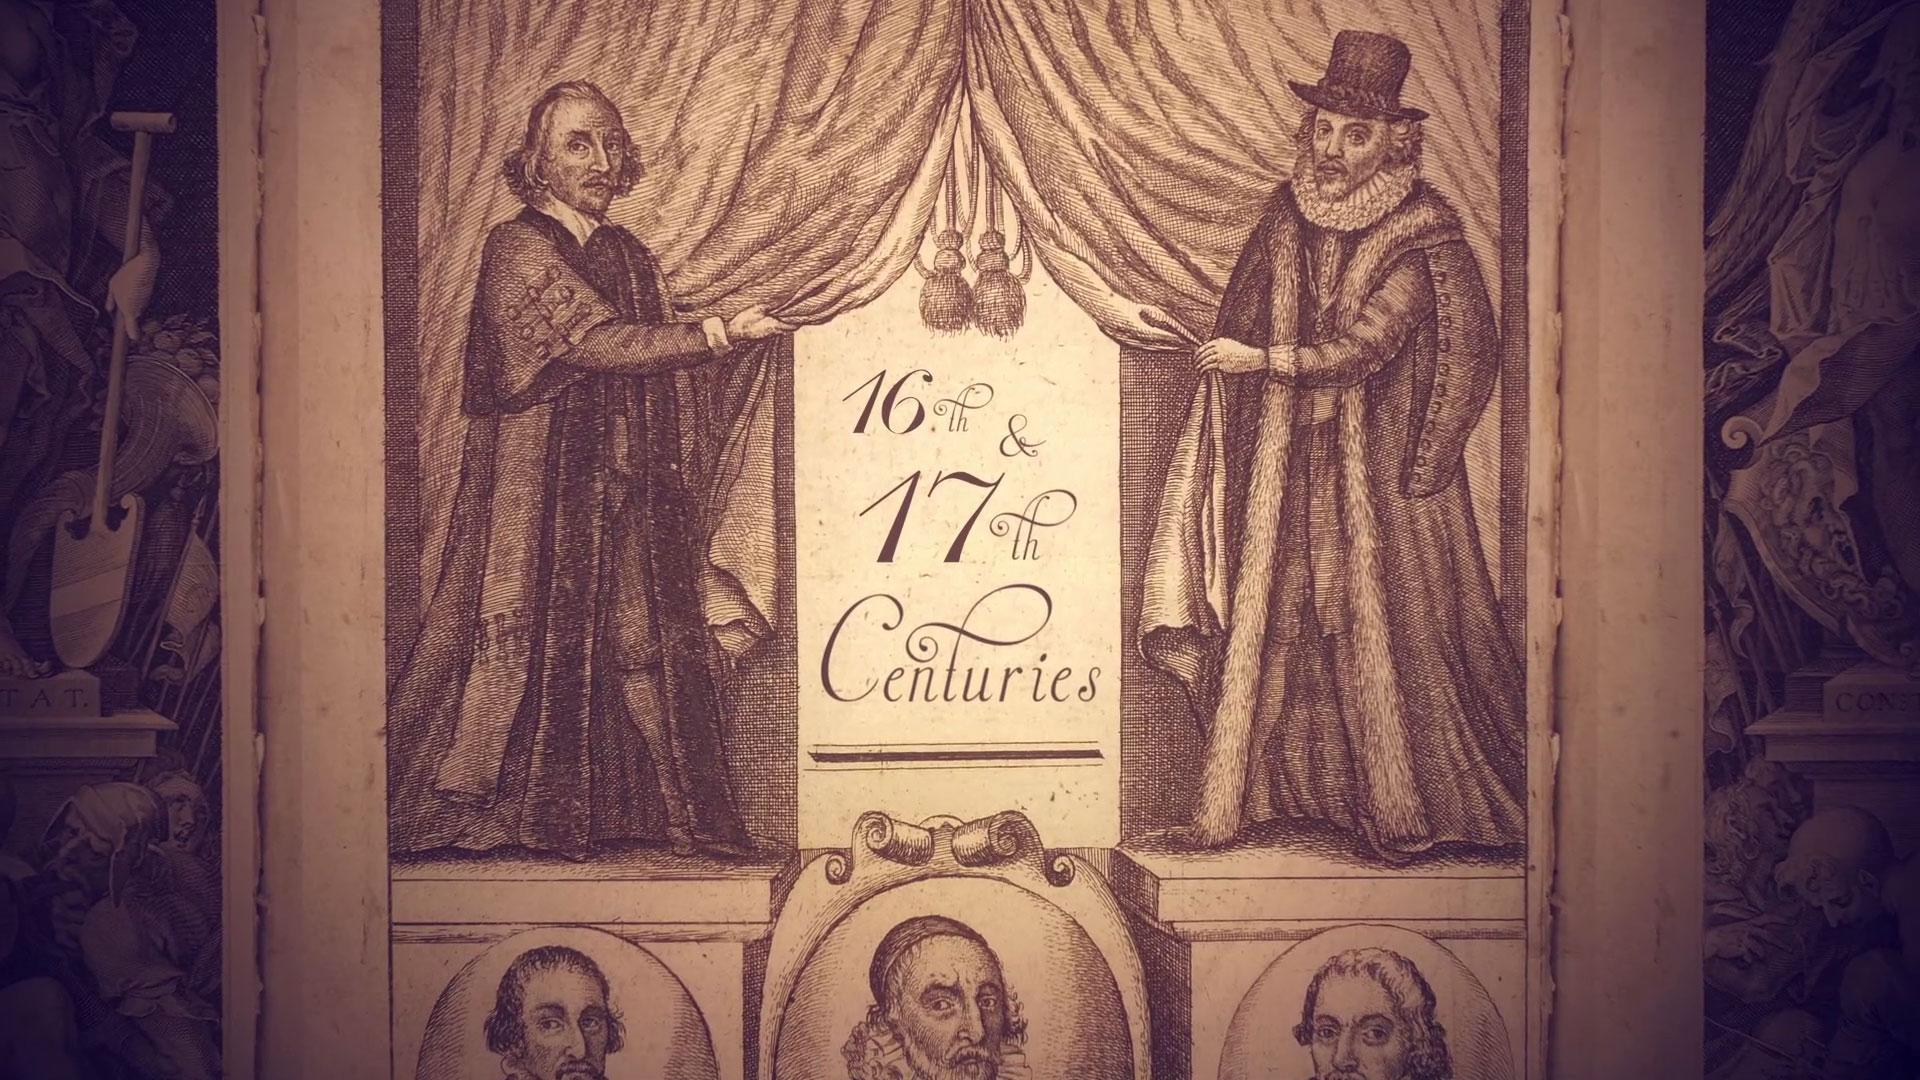 16TH & 17TH CENTURY MEDICINE